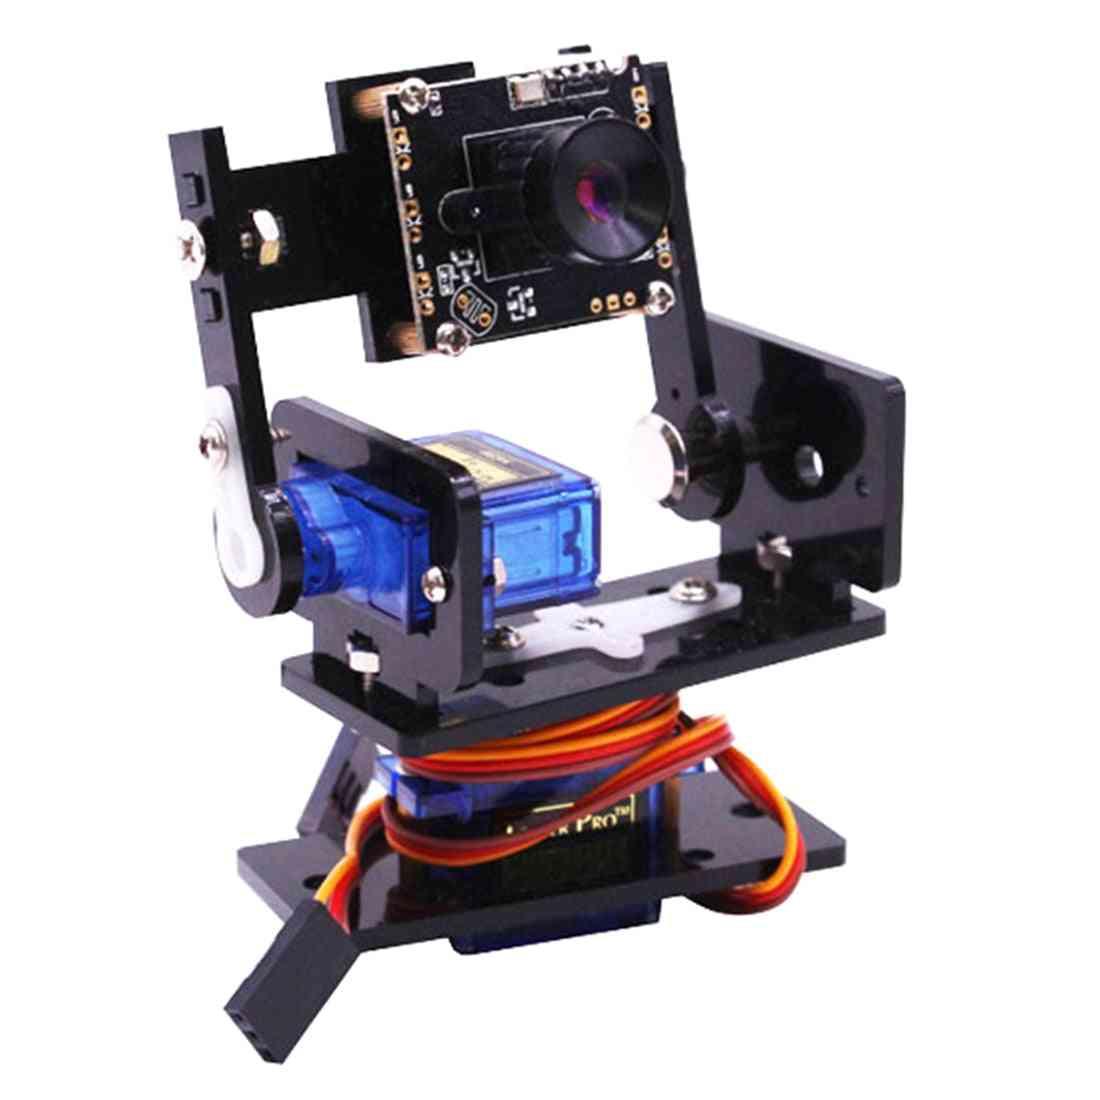 Camera Module Smart Vision Sensor Pan Tilt Kit